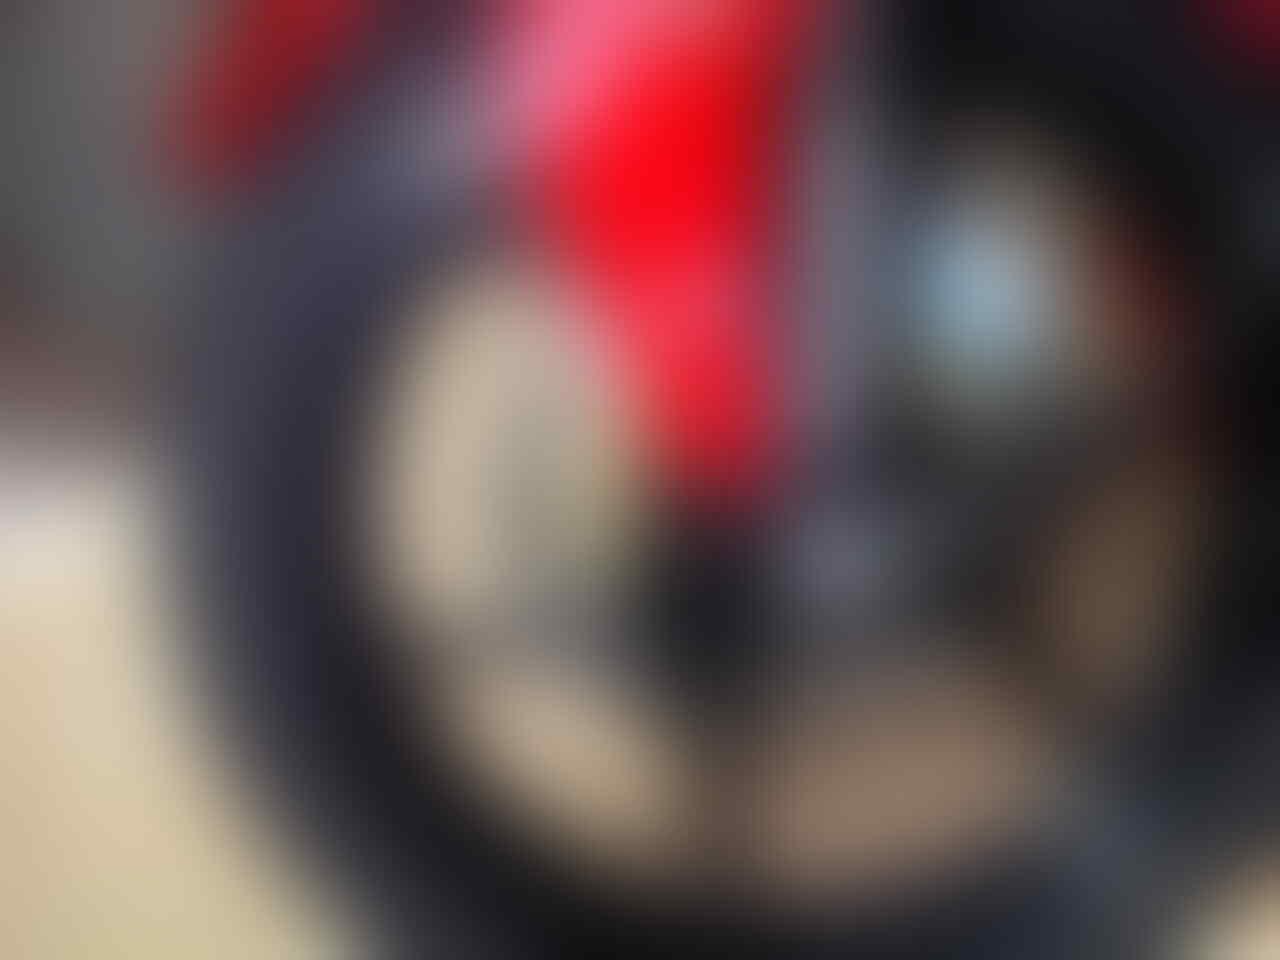 Kampas BENDIX For : Ninja 250, Ninja R, Satria, Supra, Kaze, Tiger(Old), Shogun, dll